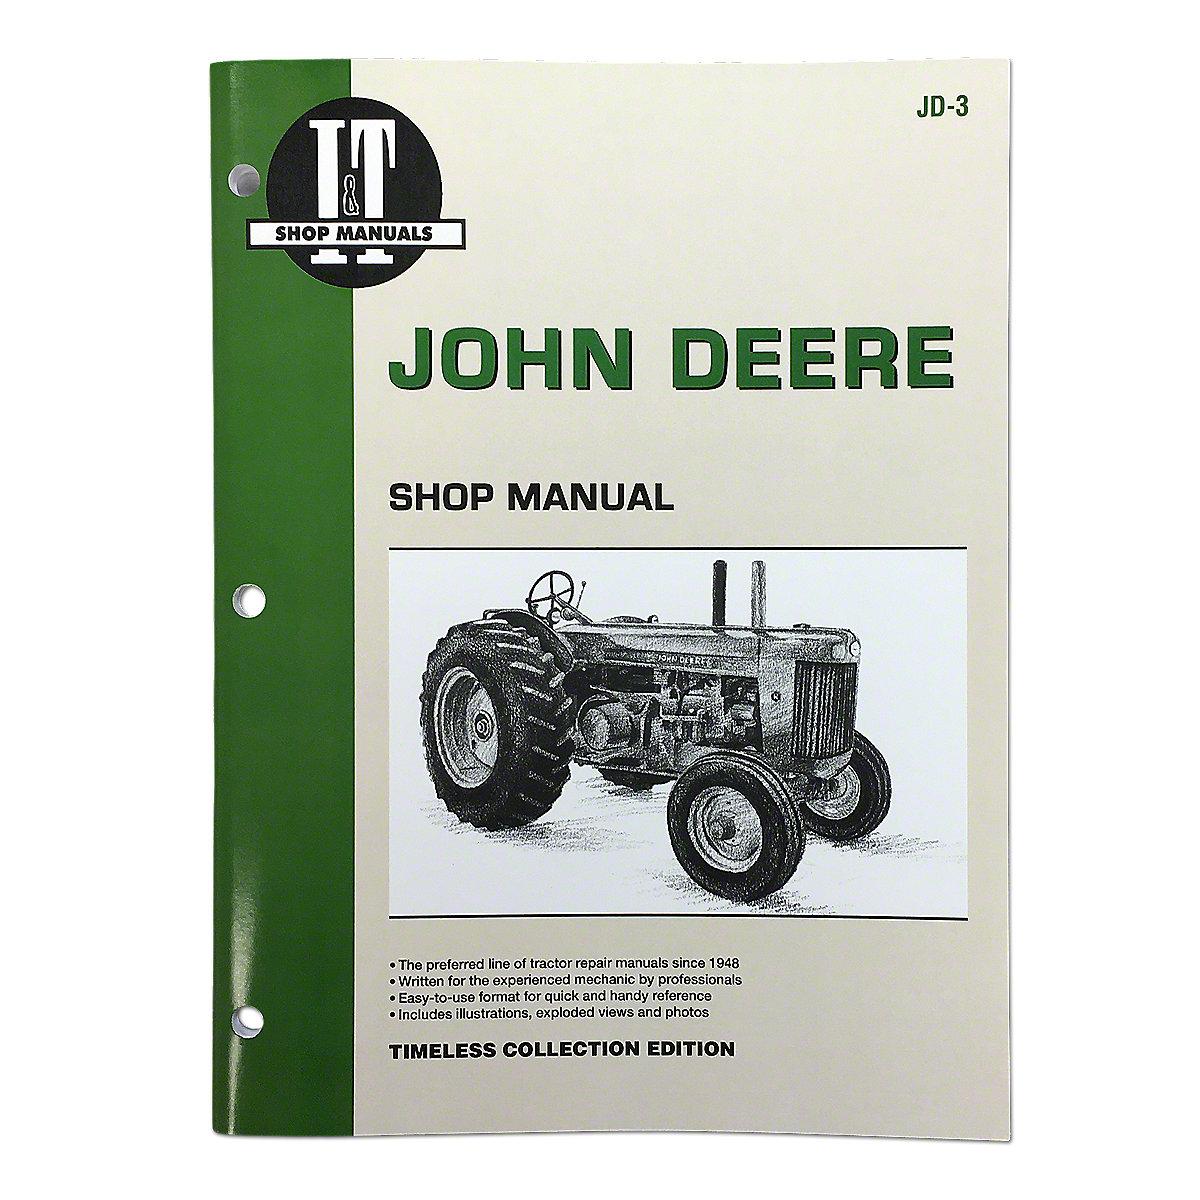 i t shop service manual jd3 rh steinertractor com Case IH Tractor Manual Ford Tractor Manuals